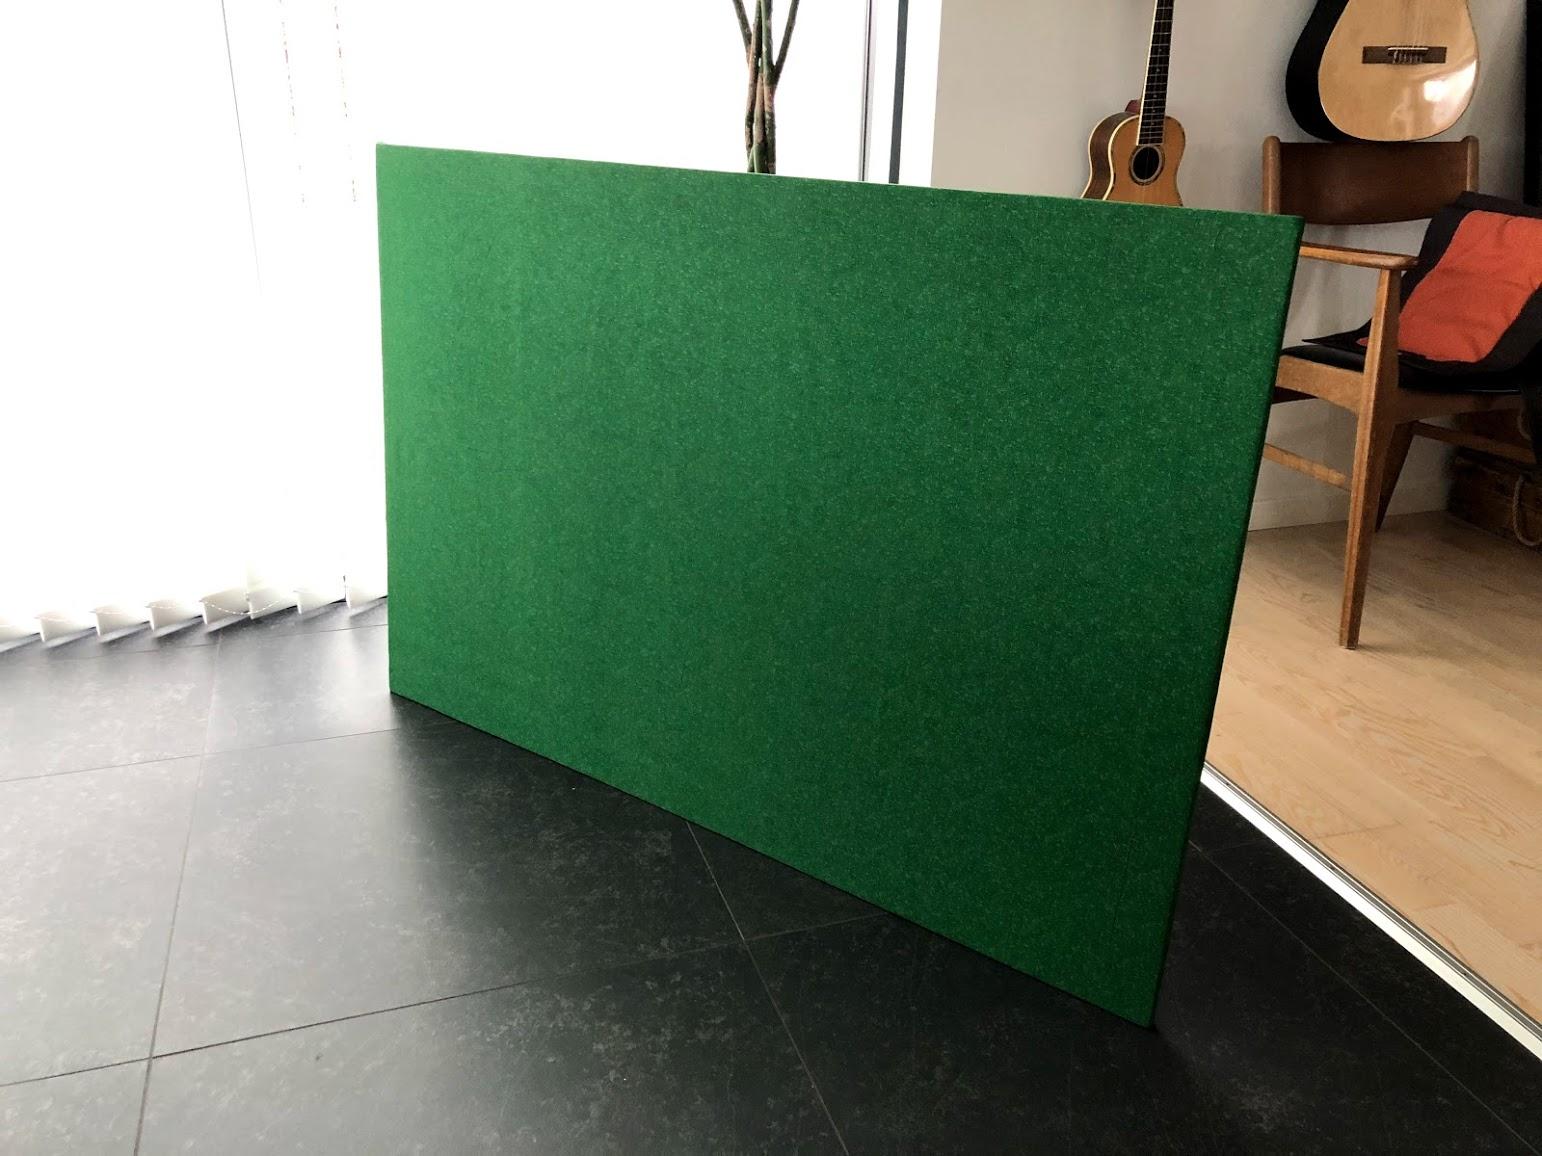 lav din egen hjemmelavet opslagstavle inspiration hvilken plade masonit træfiber hvordan laver man hjemmelavet tavle